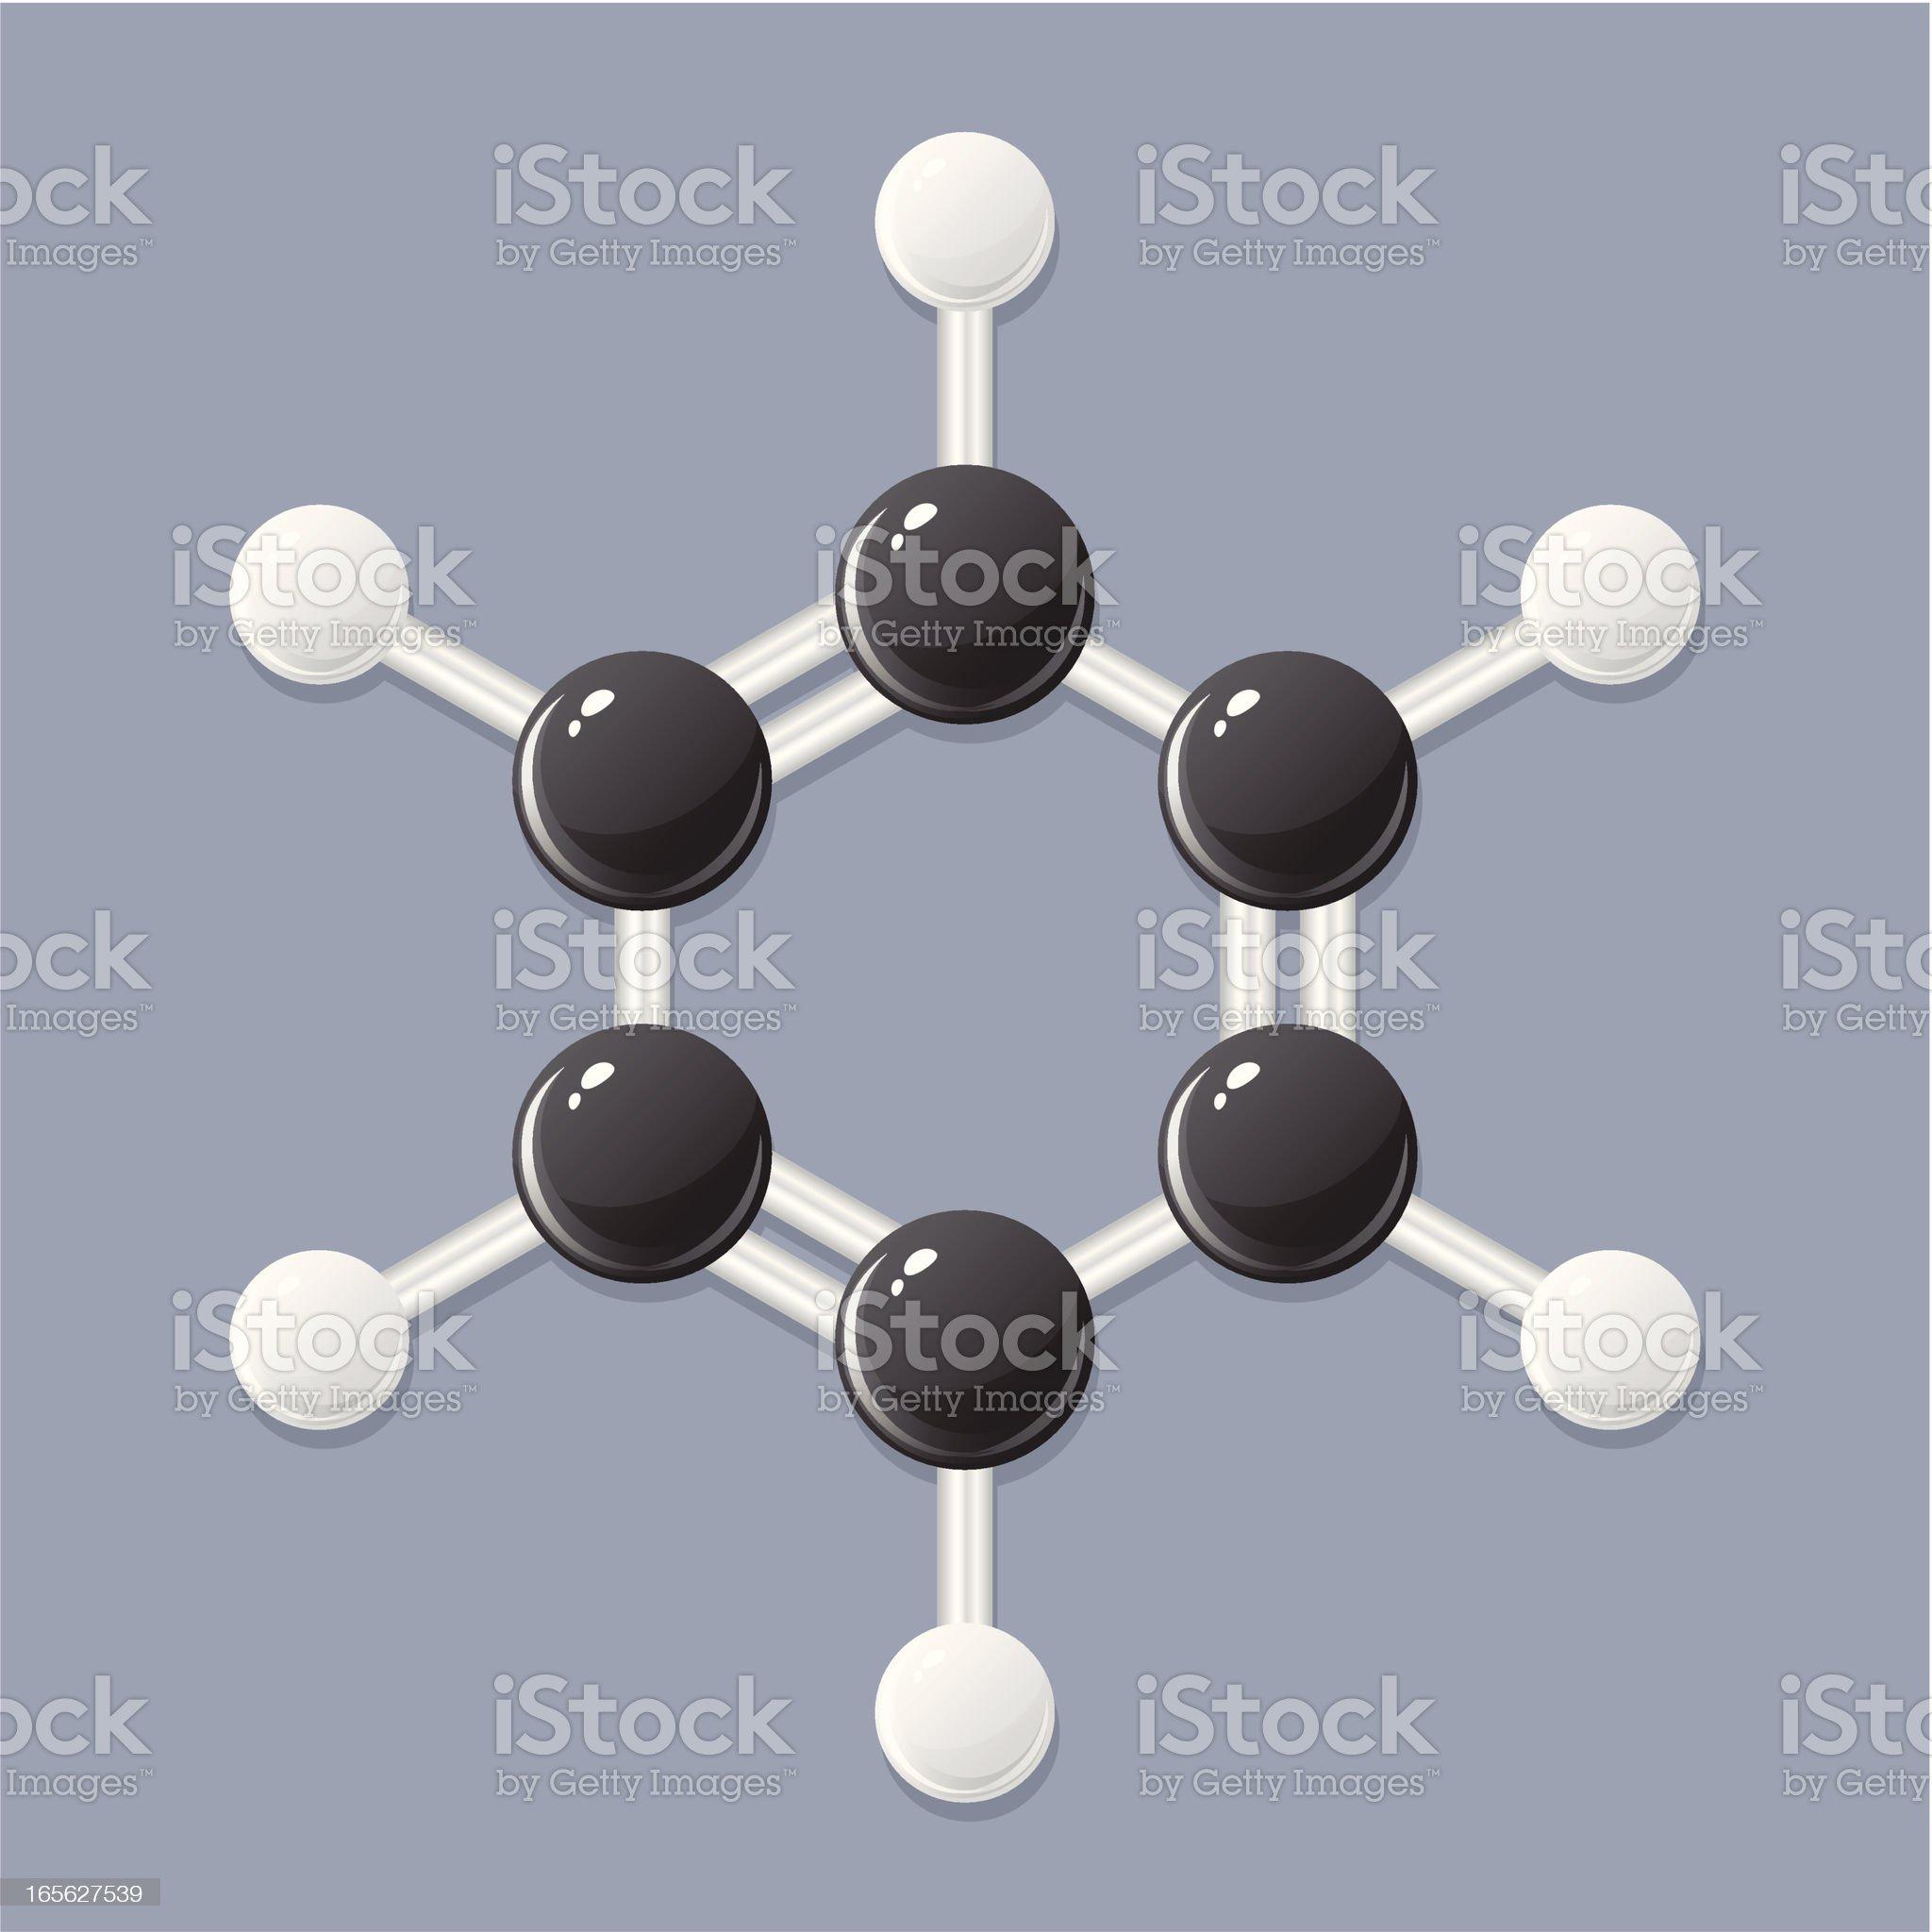 Benzene molecule royalty-free stock vector art